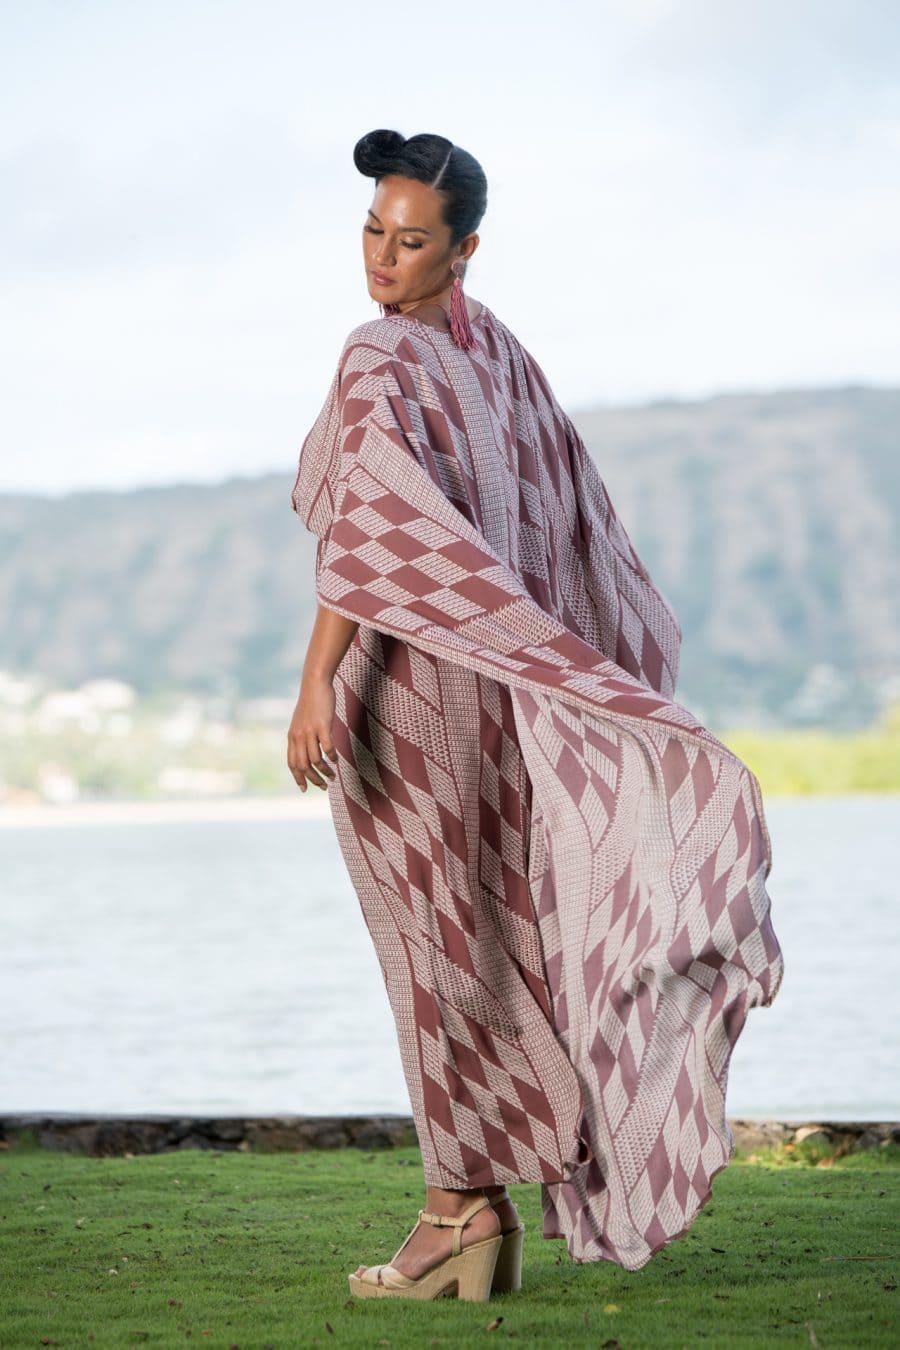 Model wearing Manu O'O Dress in Fired Brick-White Kamehameha Pattern - Back View